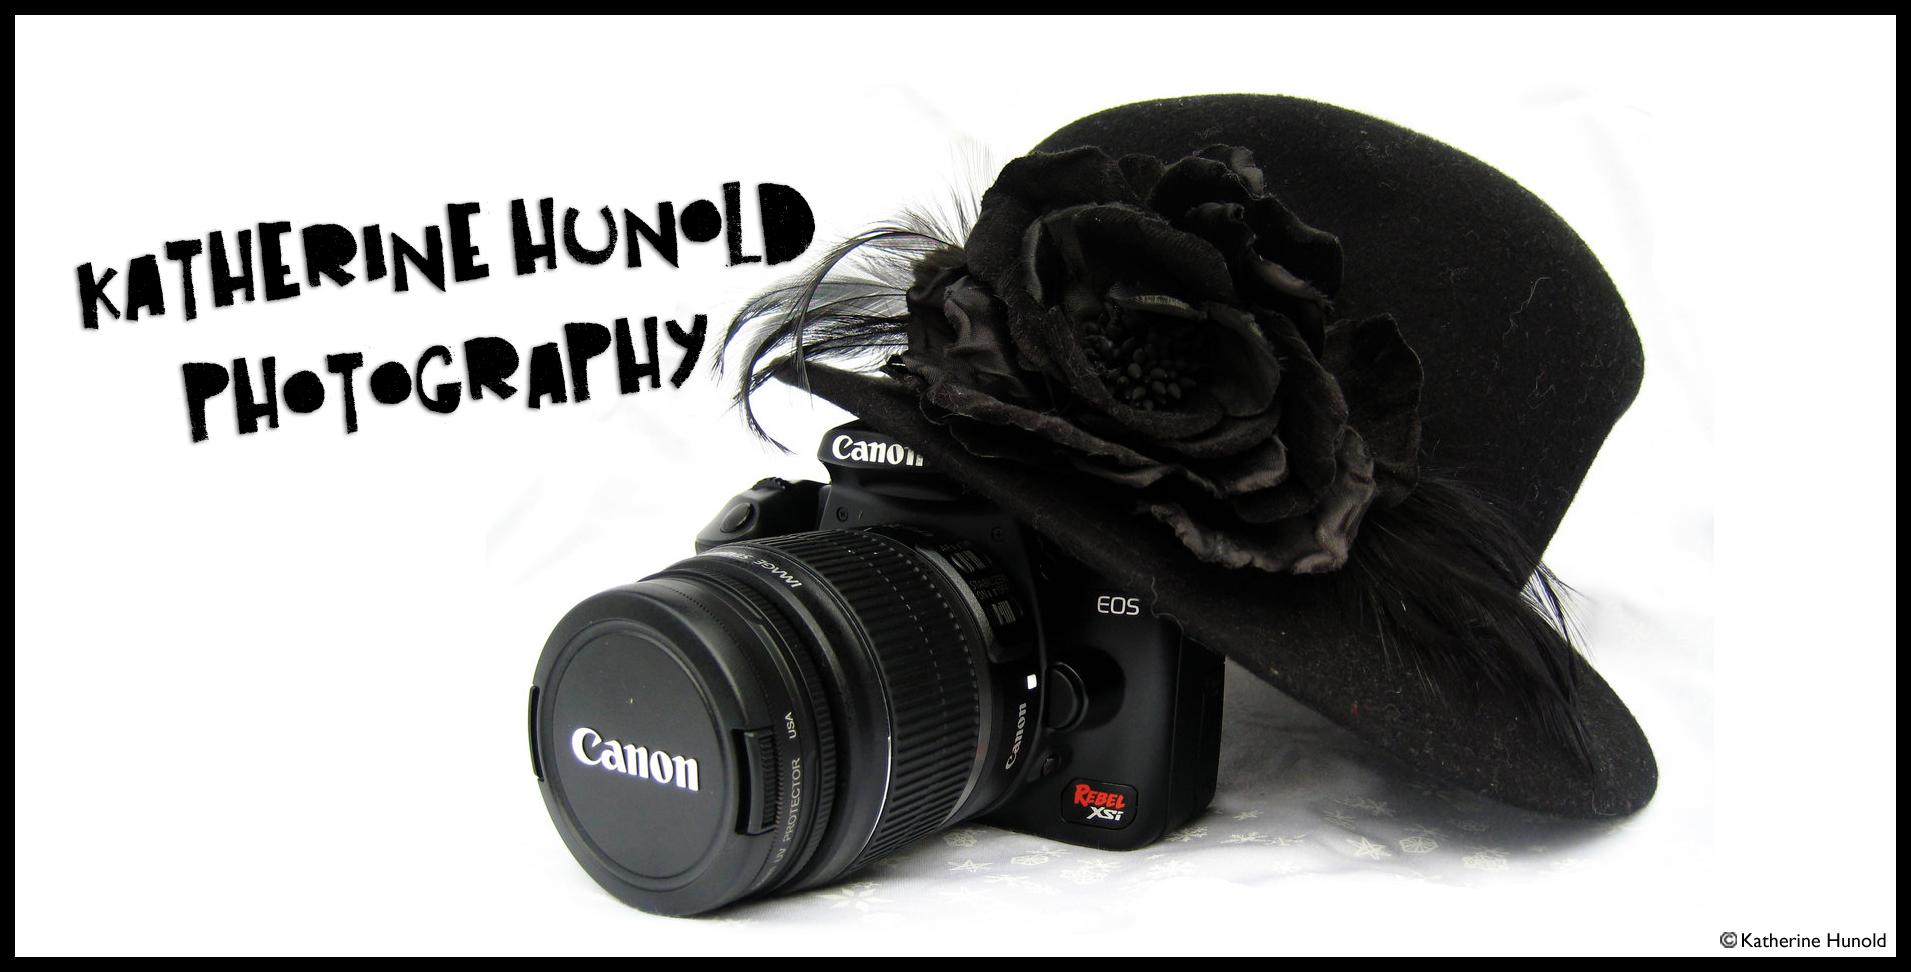 Katherine Hunold Photography